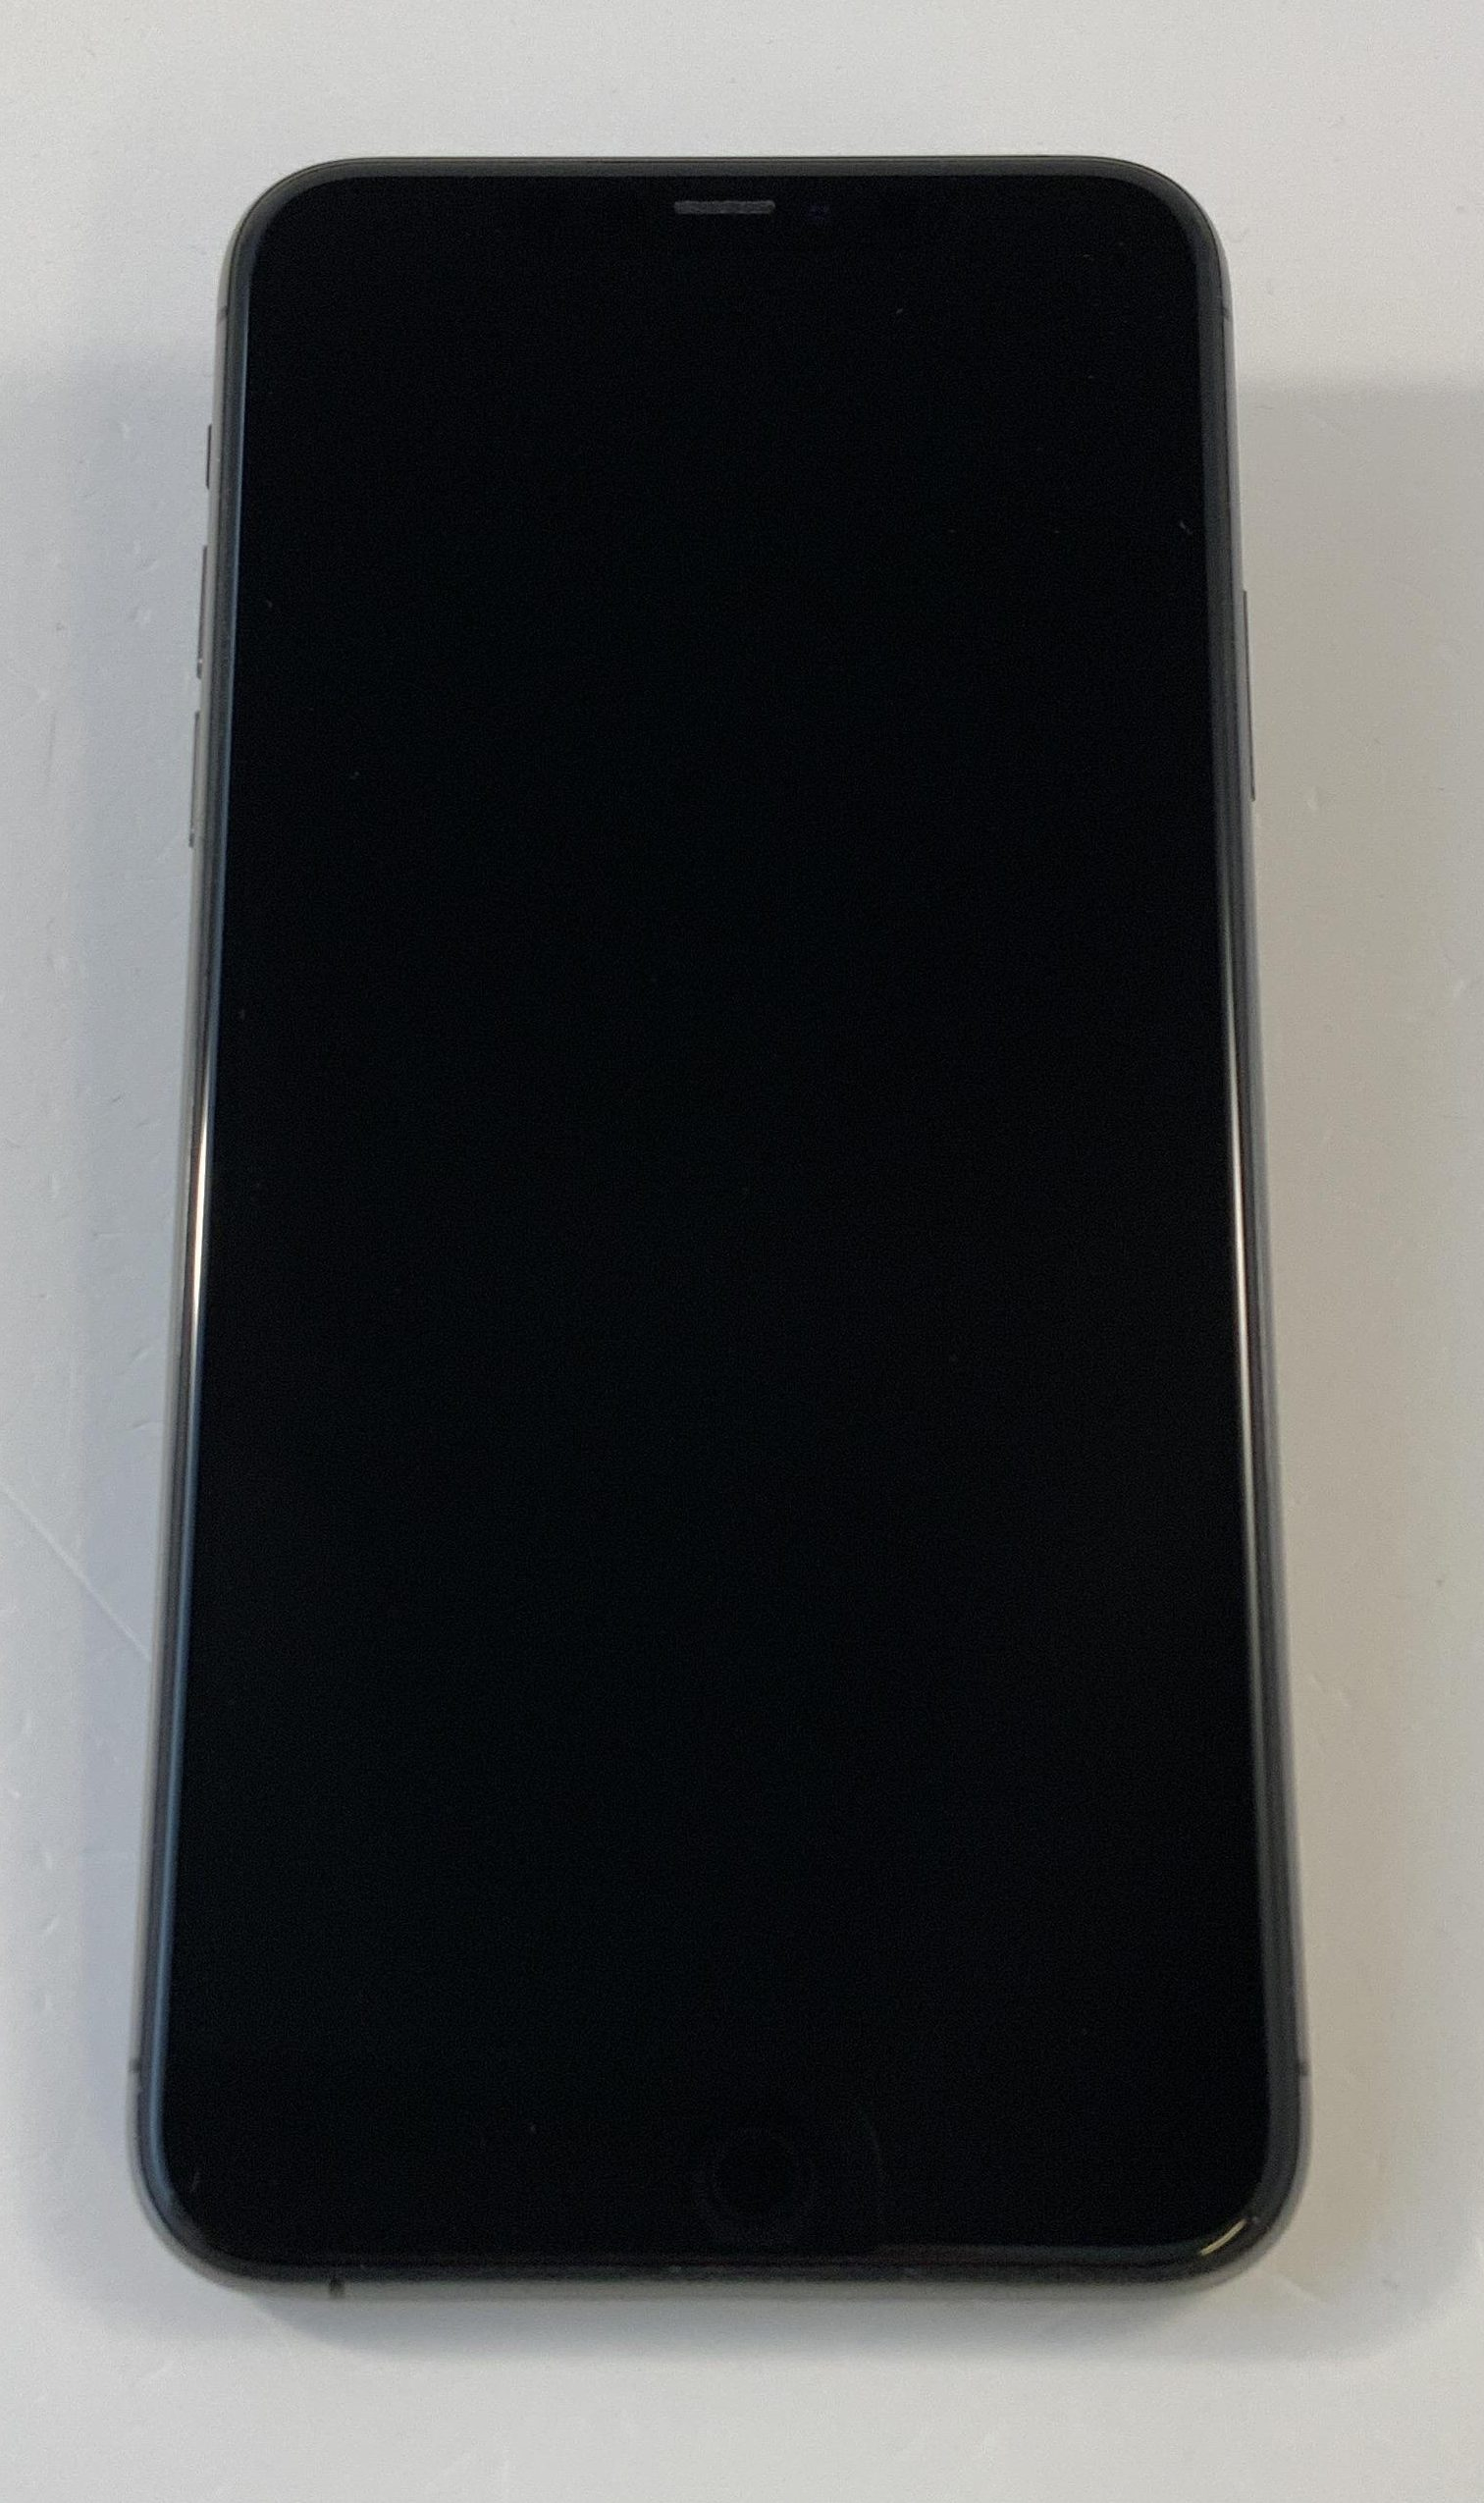 iPhone 11 Pro Max 64GB, 64GB, Space Gray, Bild 1